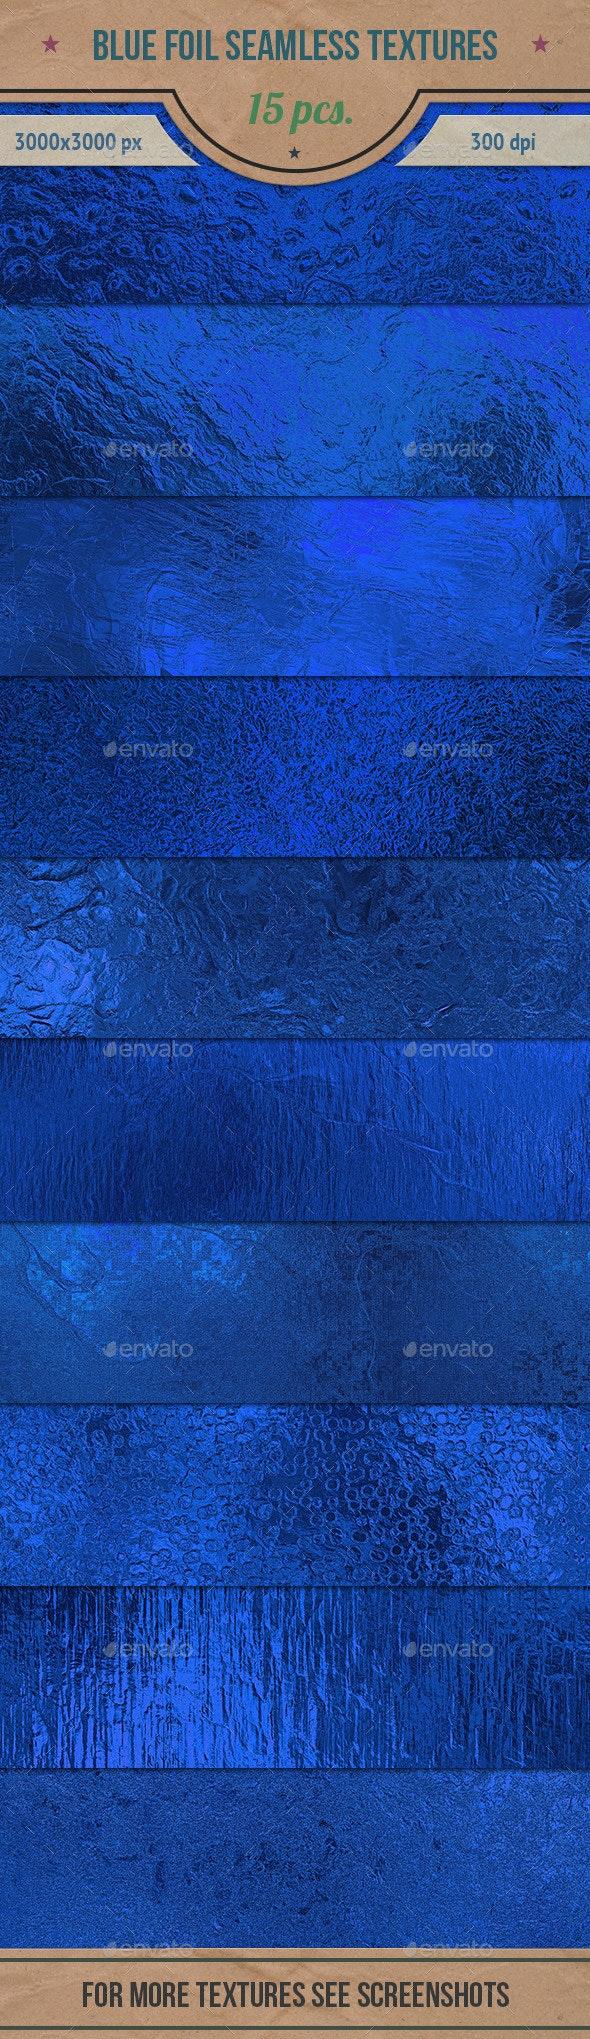 Blue Foil Seamless HD Textures Pack - Textures